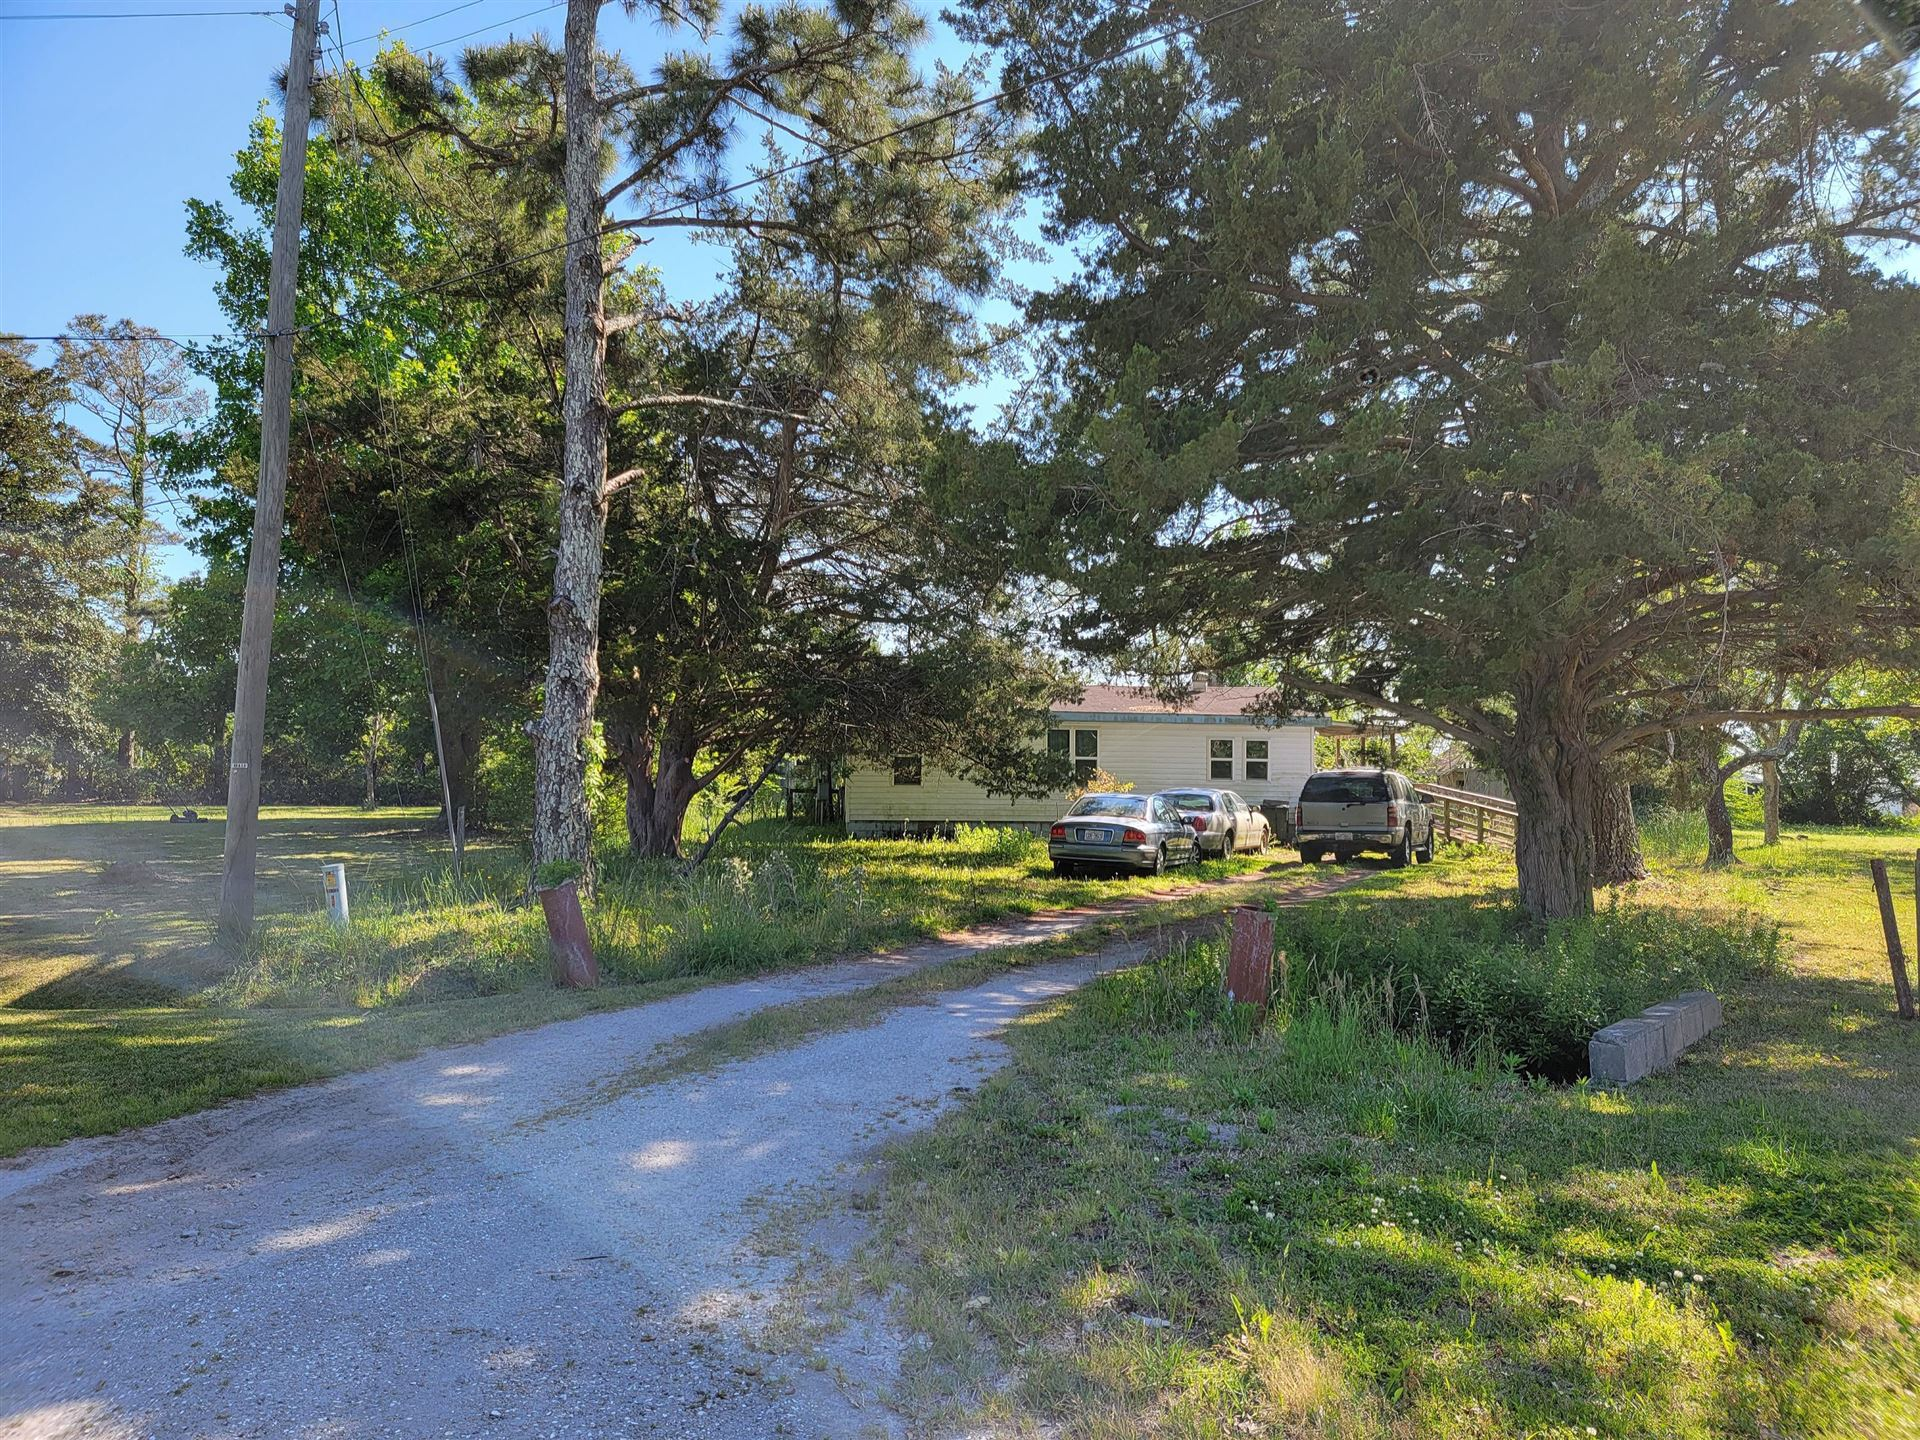 Photo of 108 Park Avenue, Beaufort, NC 28516 (MLS # 100268332)